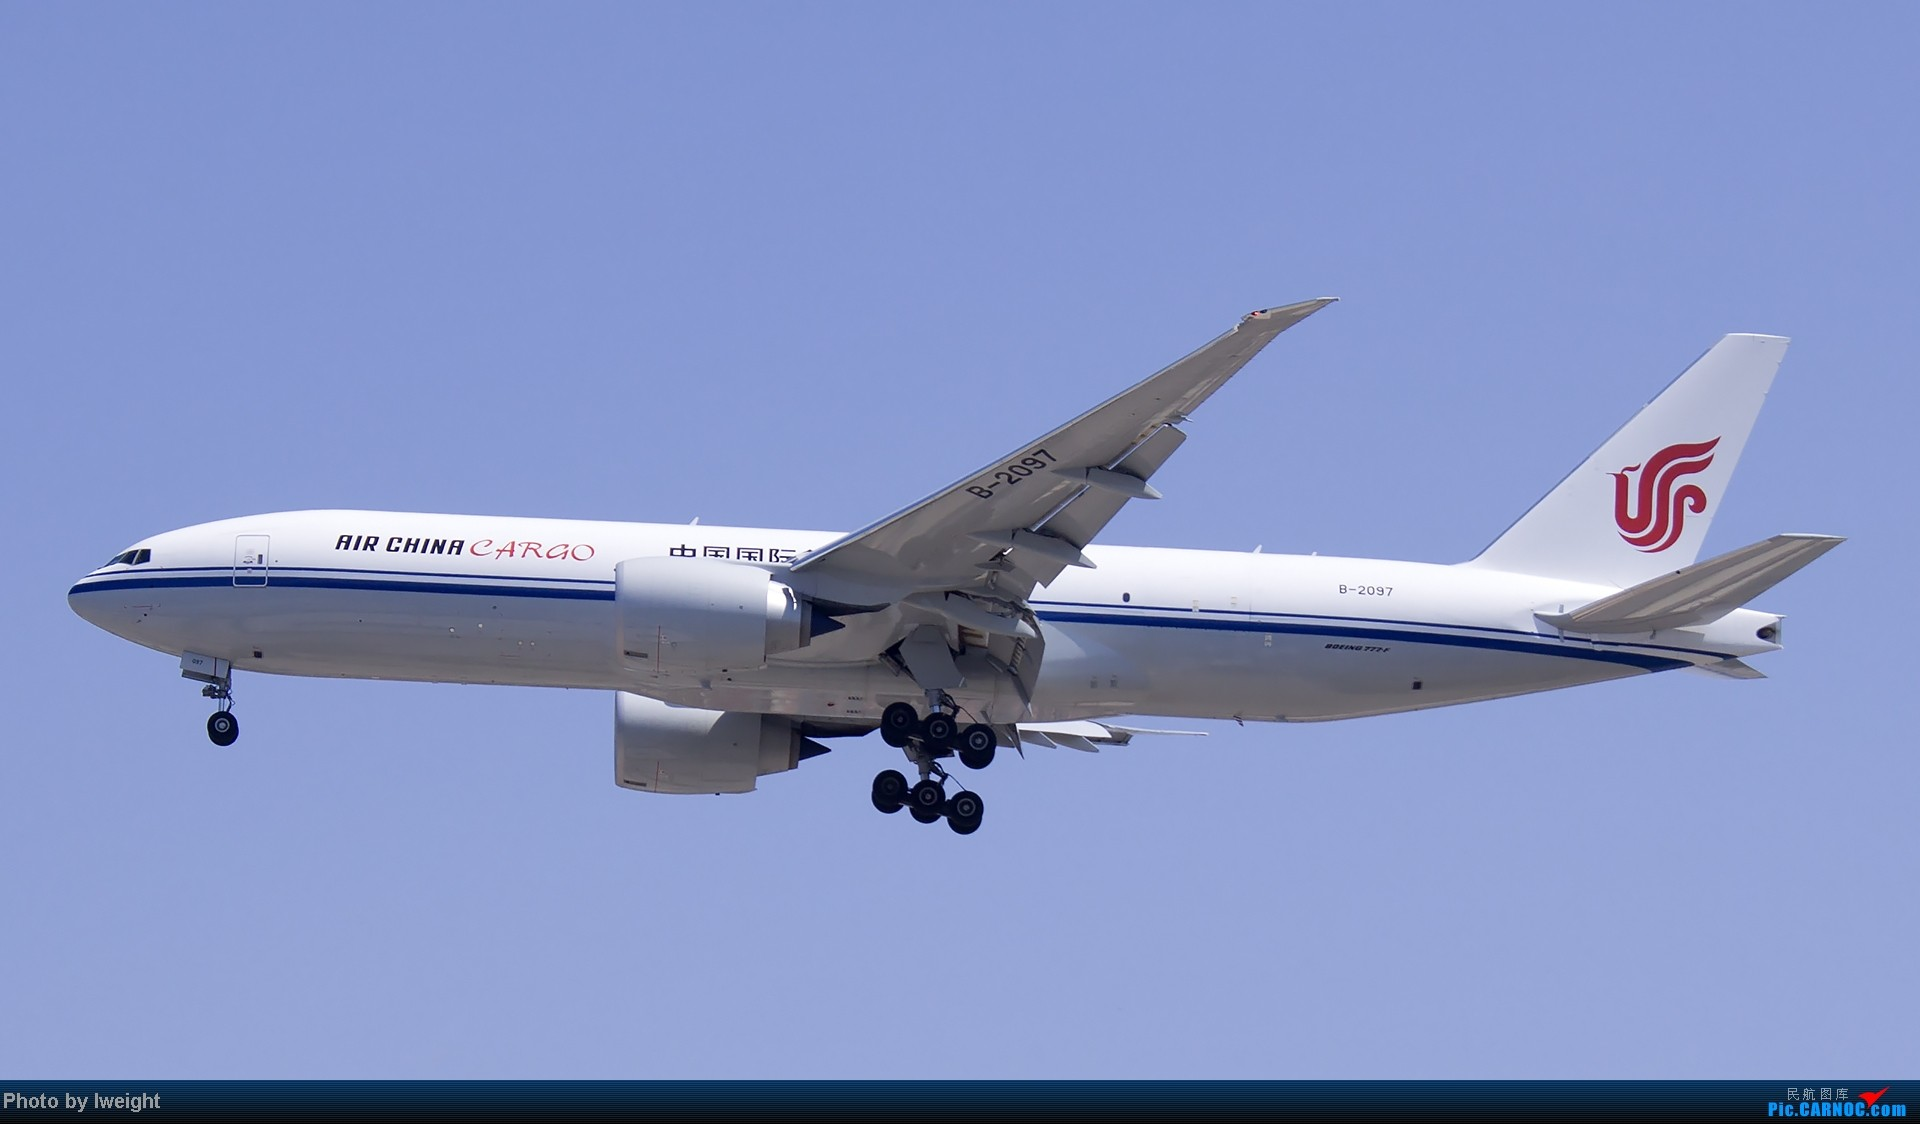 Re:[原创]北京难得的好天气,收获多种机型和彩绘,遗憾的是再次错过卡航巴塞罗那彩绘 BOEING 777-200 B-2097 中国北京首都机场